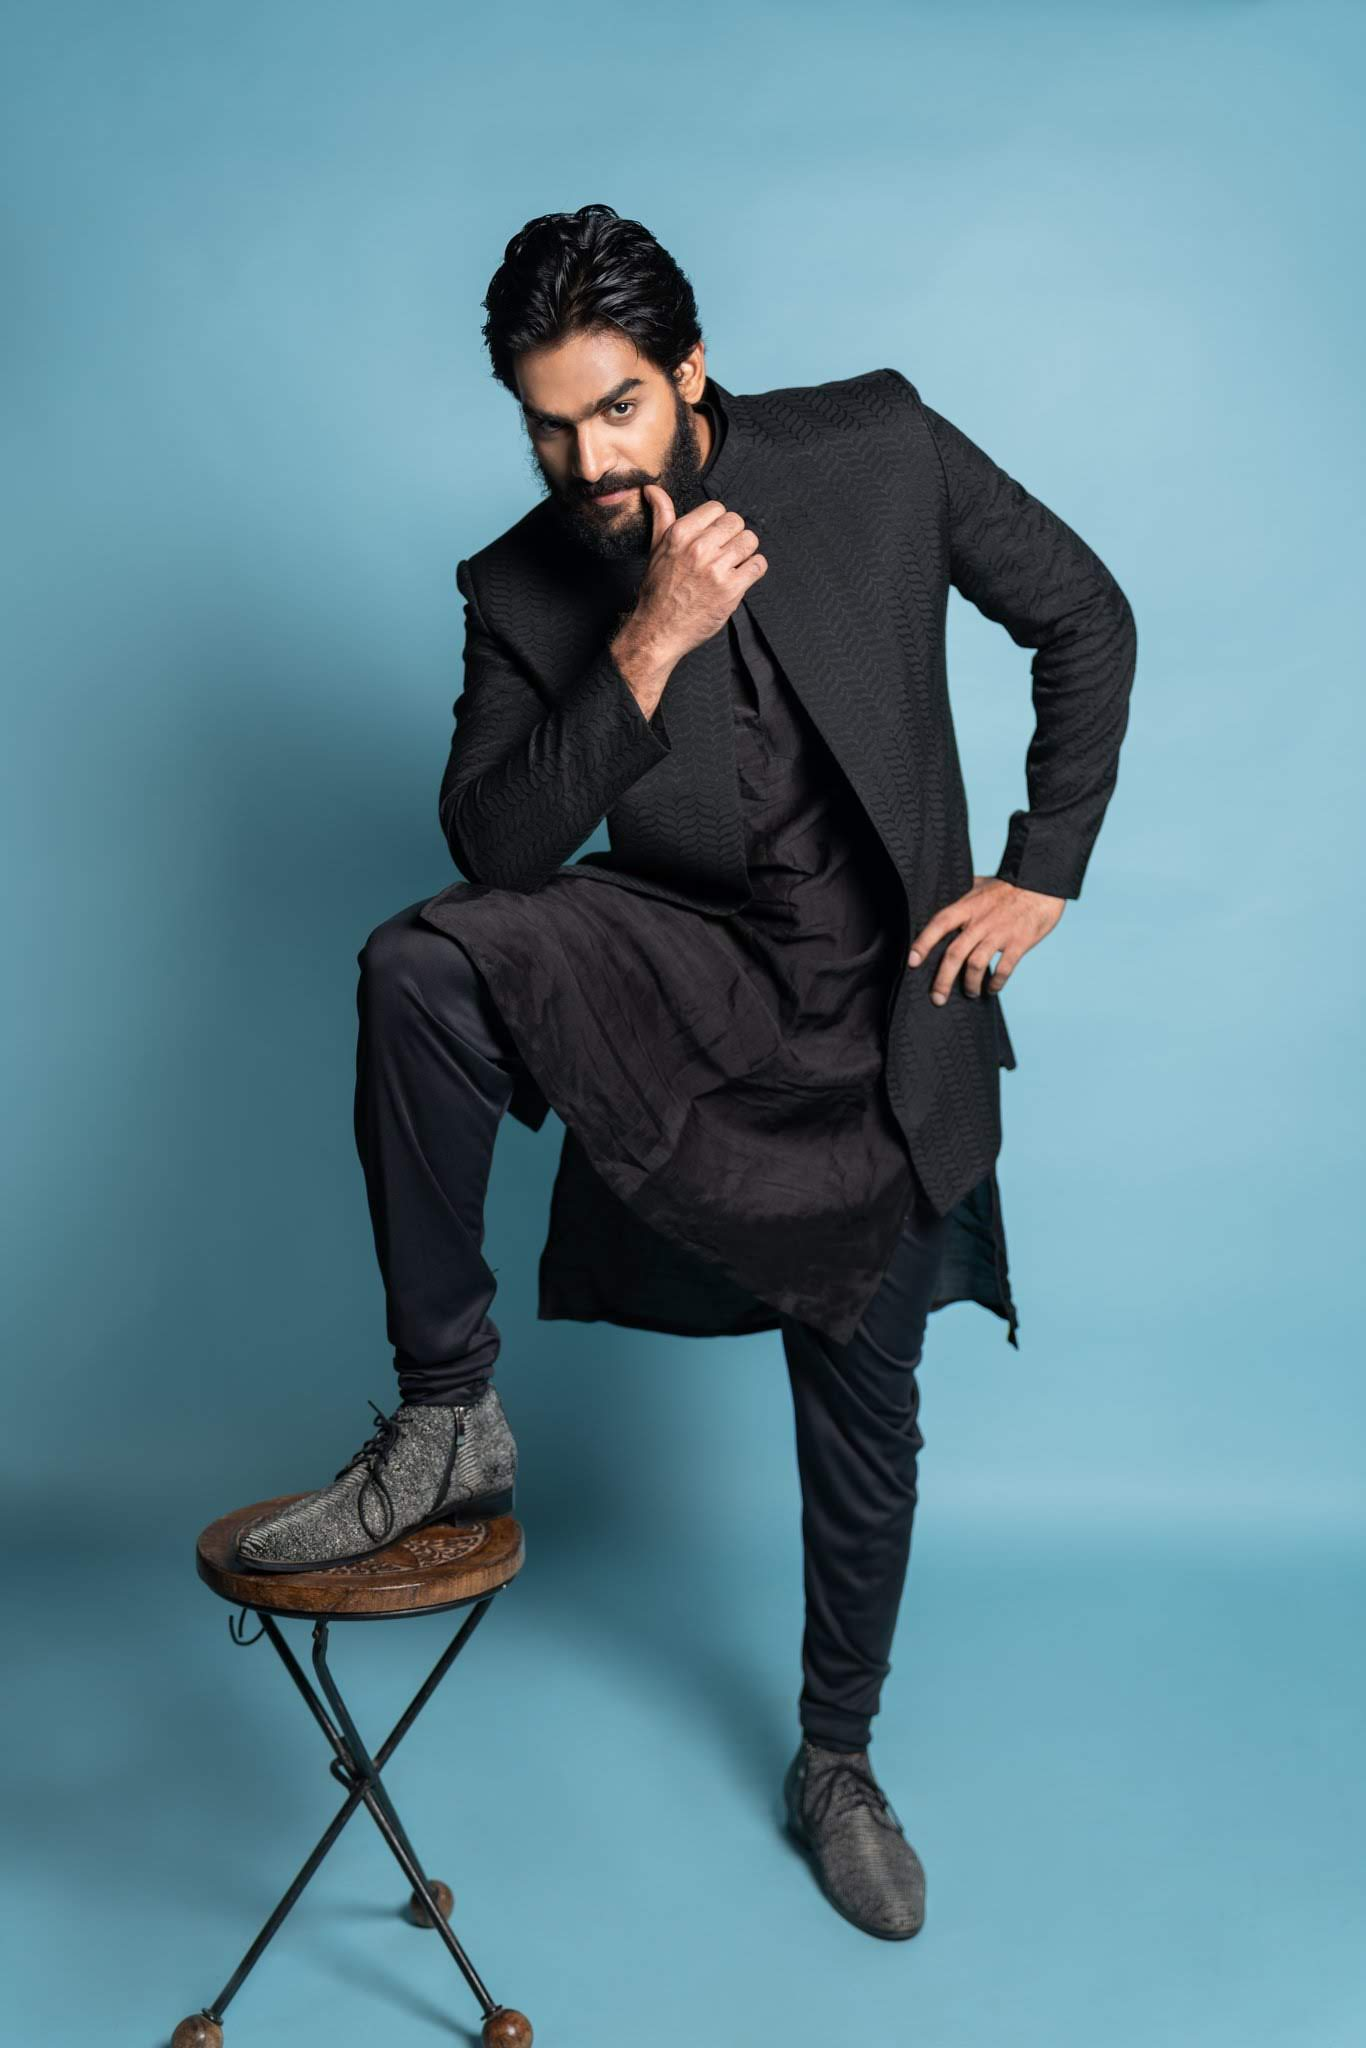 kartikeya-gummakonda-90ml-fame-actor-34